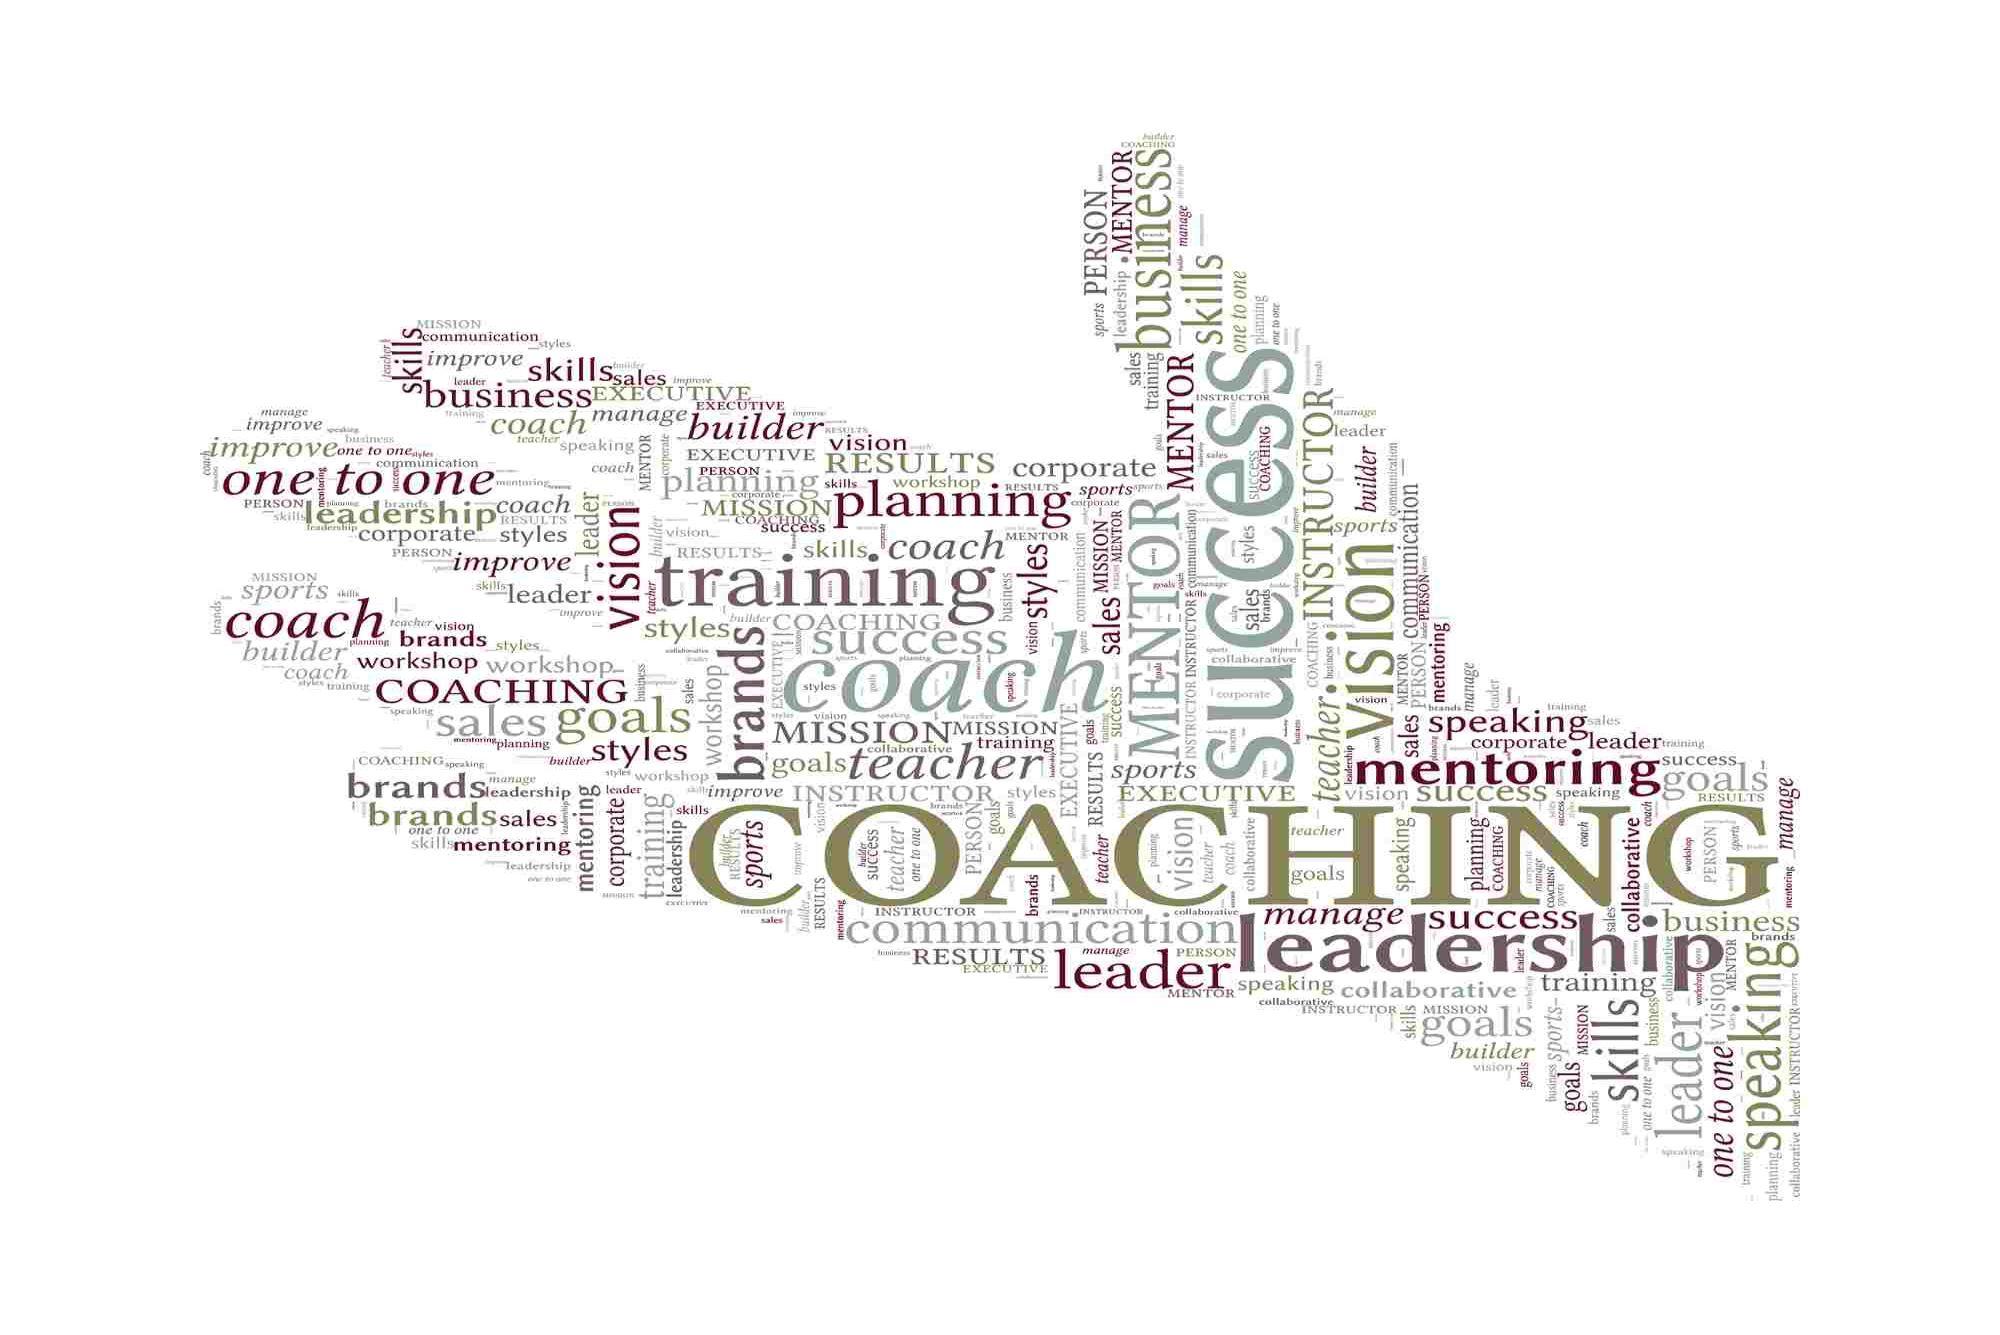 ts-sales-coaching-image